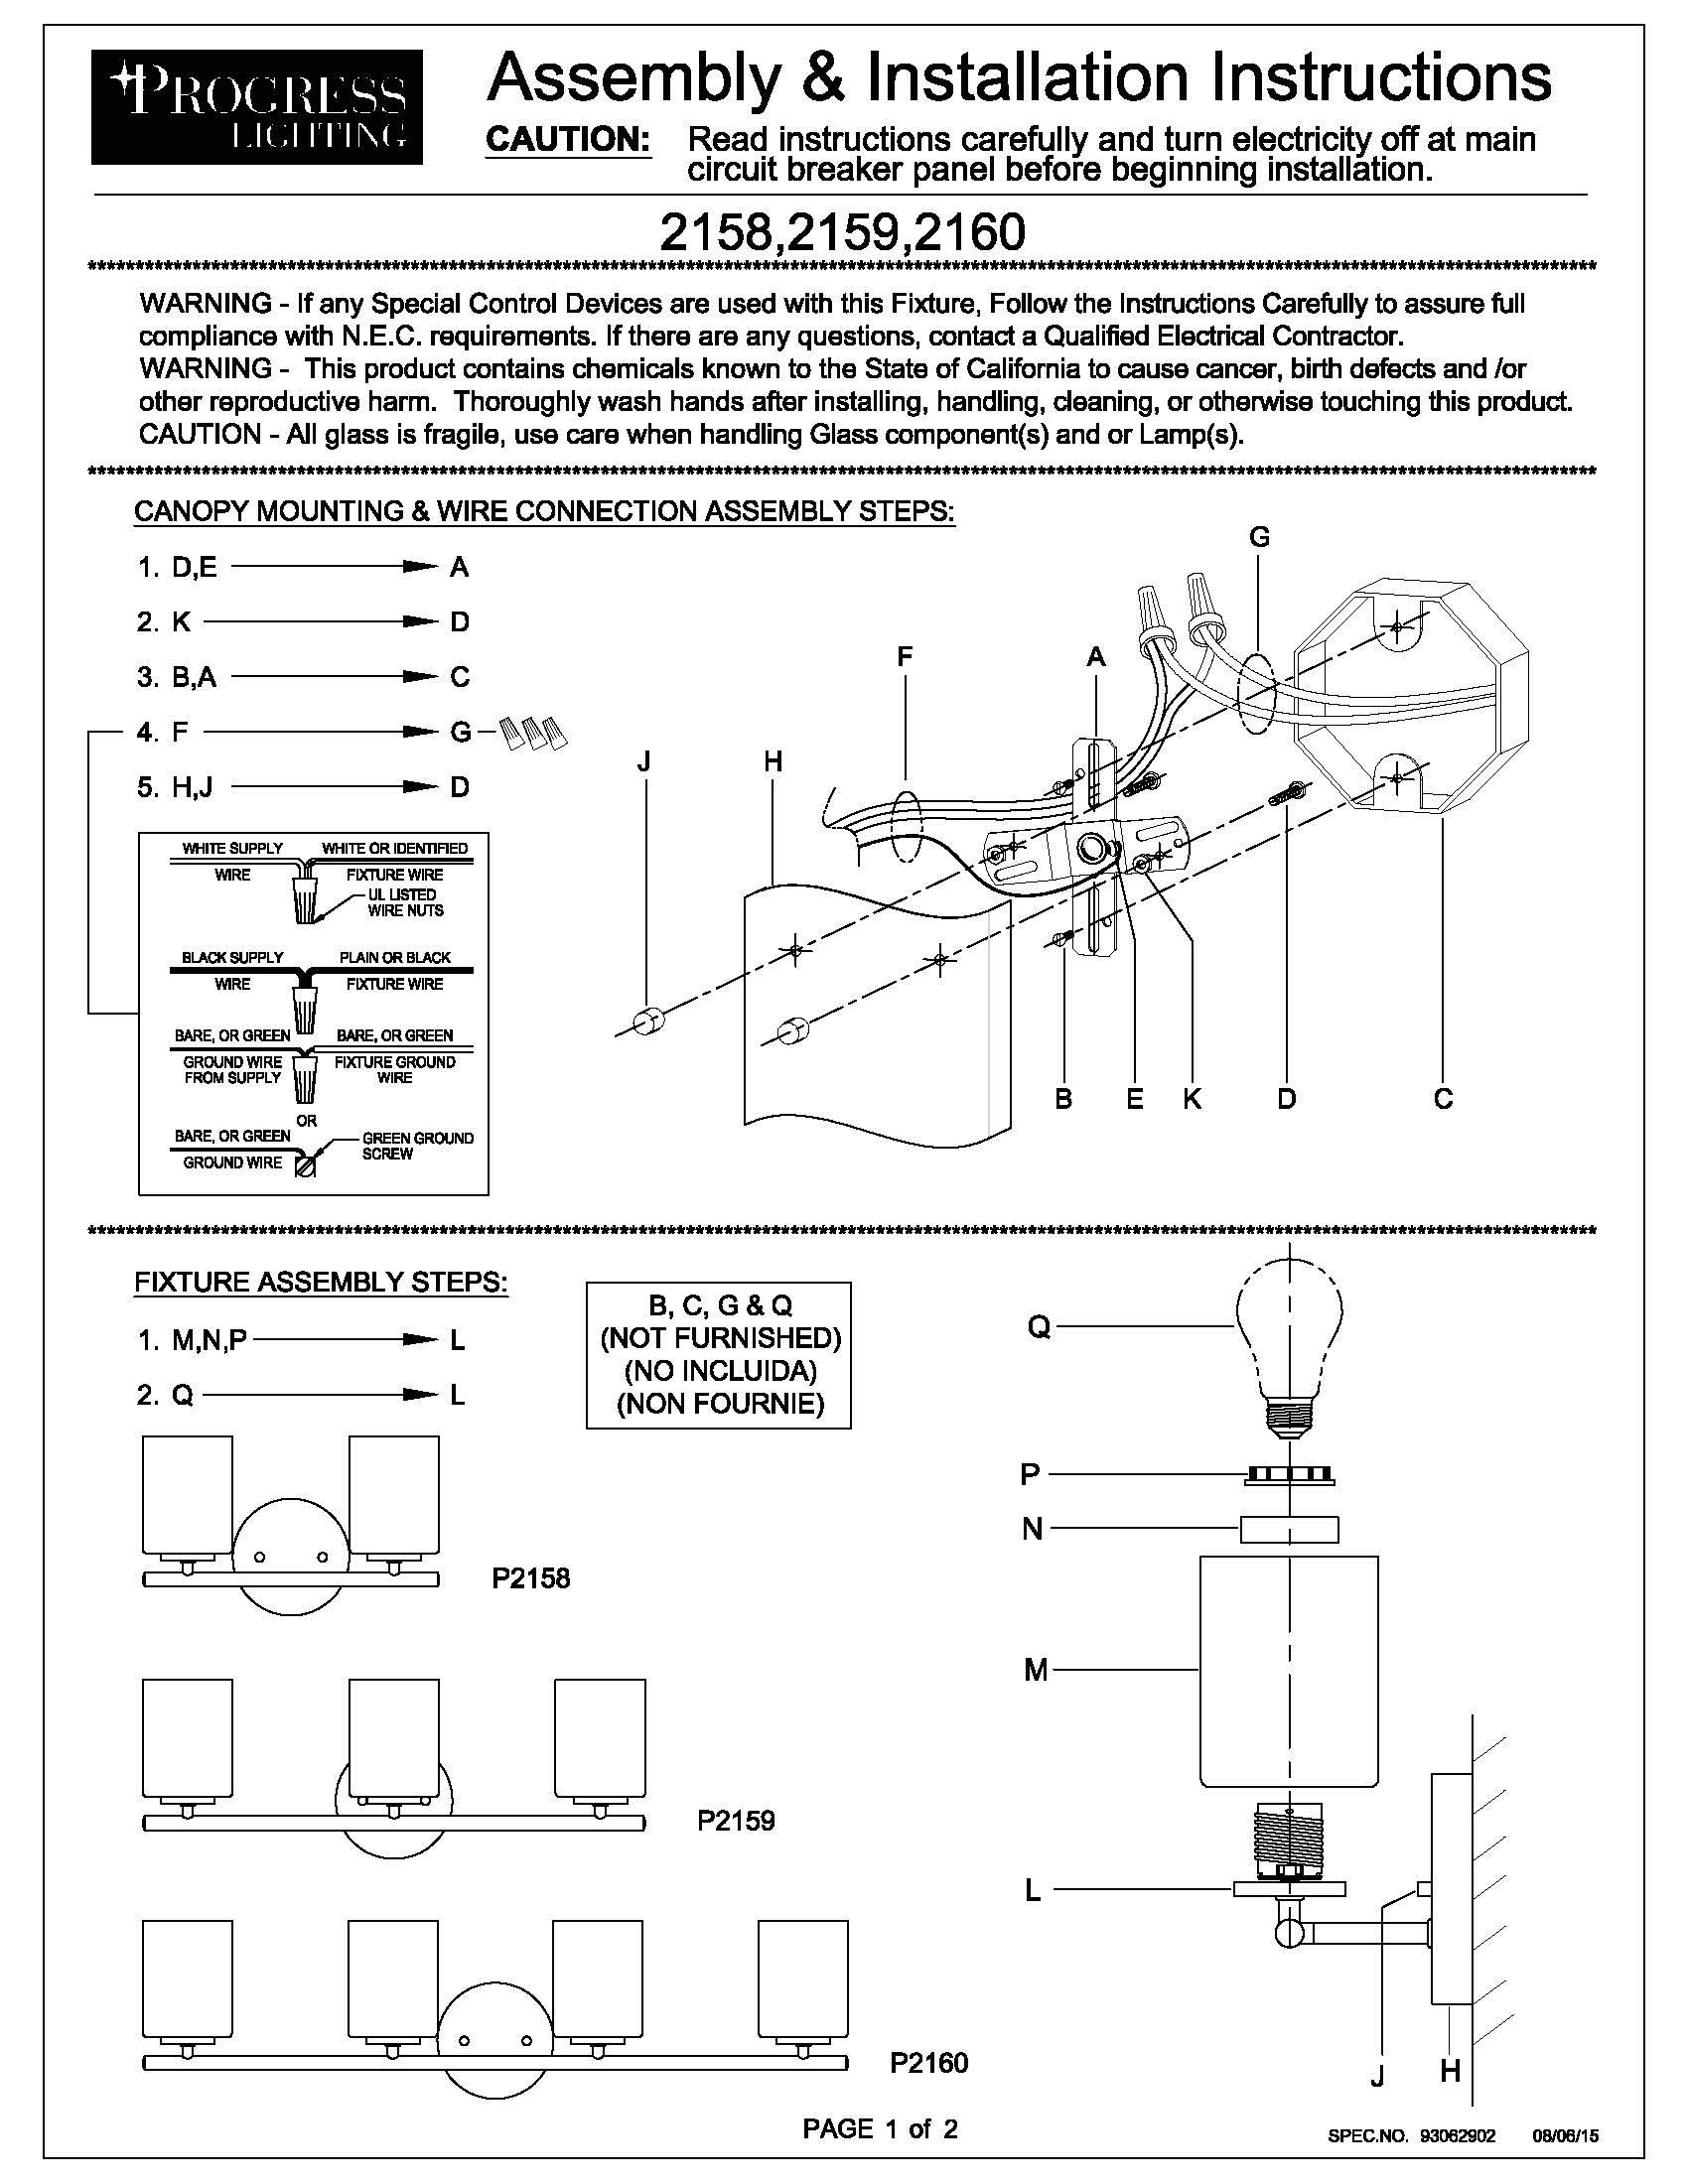 Progress Lighting P2159-09 Contemporary/Soft 3-100W Med Bath Bracket, Brushed Nickel by Progress Lighting (Image #3)